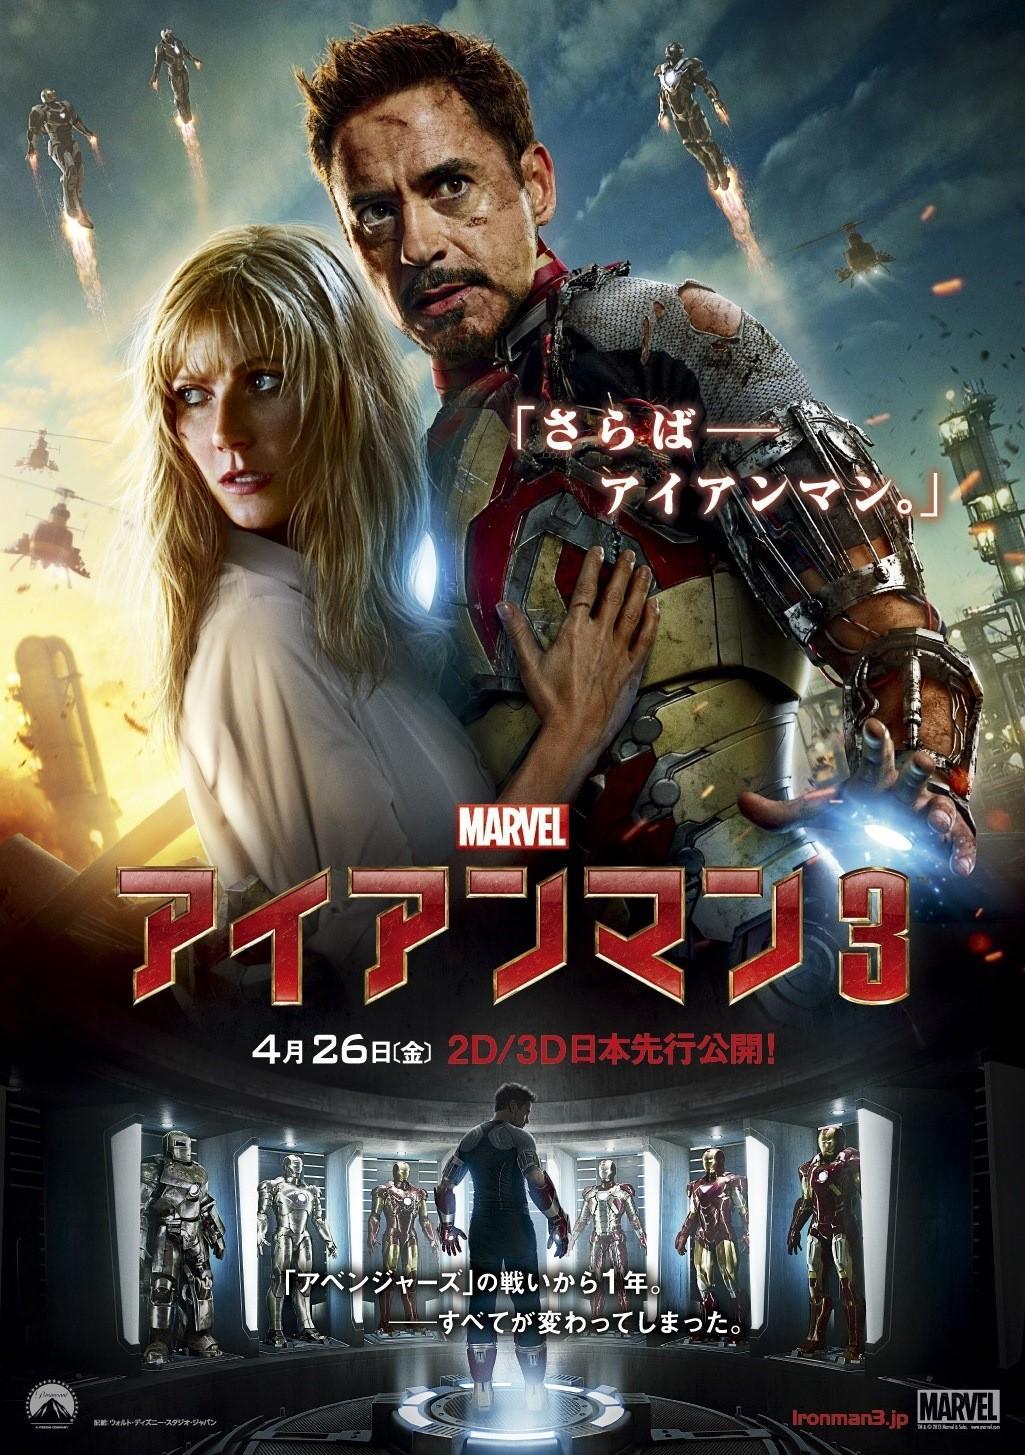 Iron_Man_3_New_Poster_Japan_Cine_1